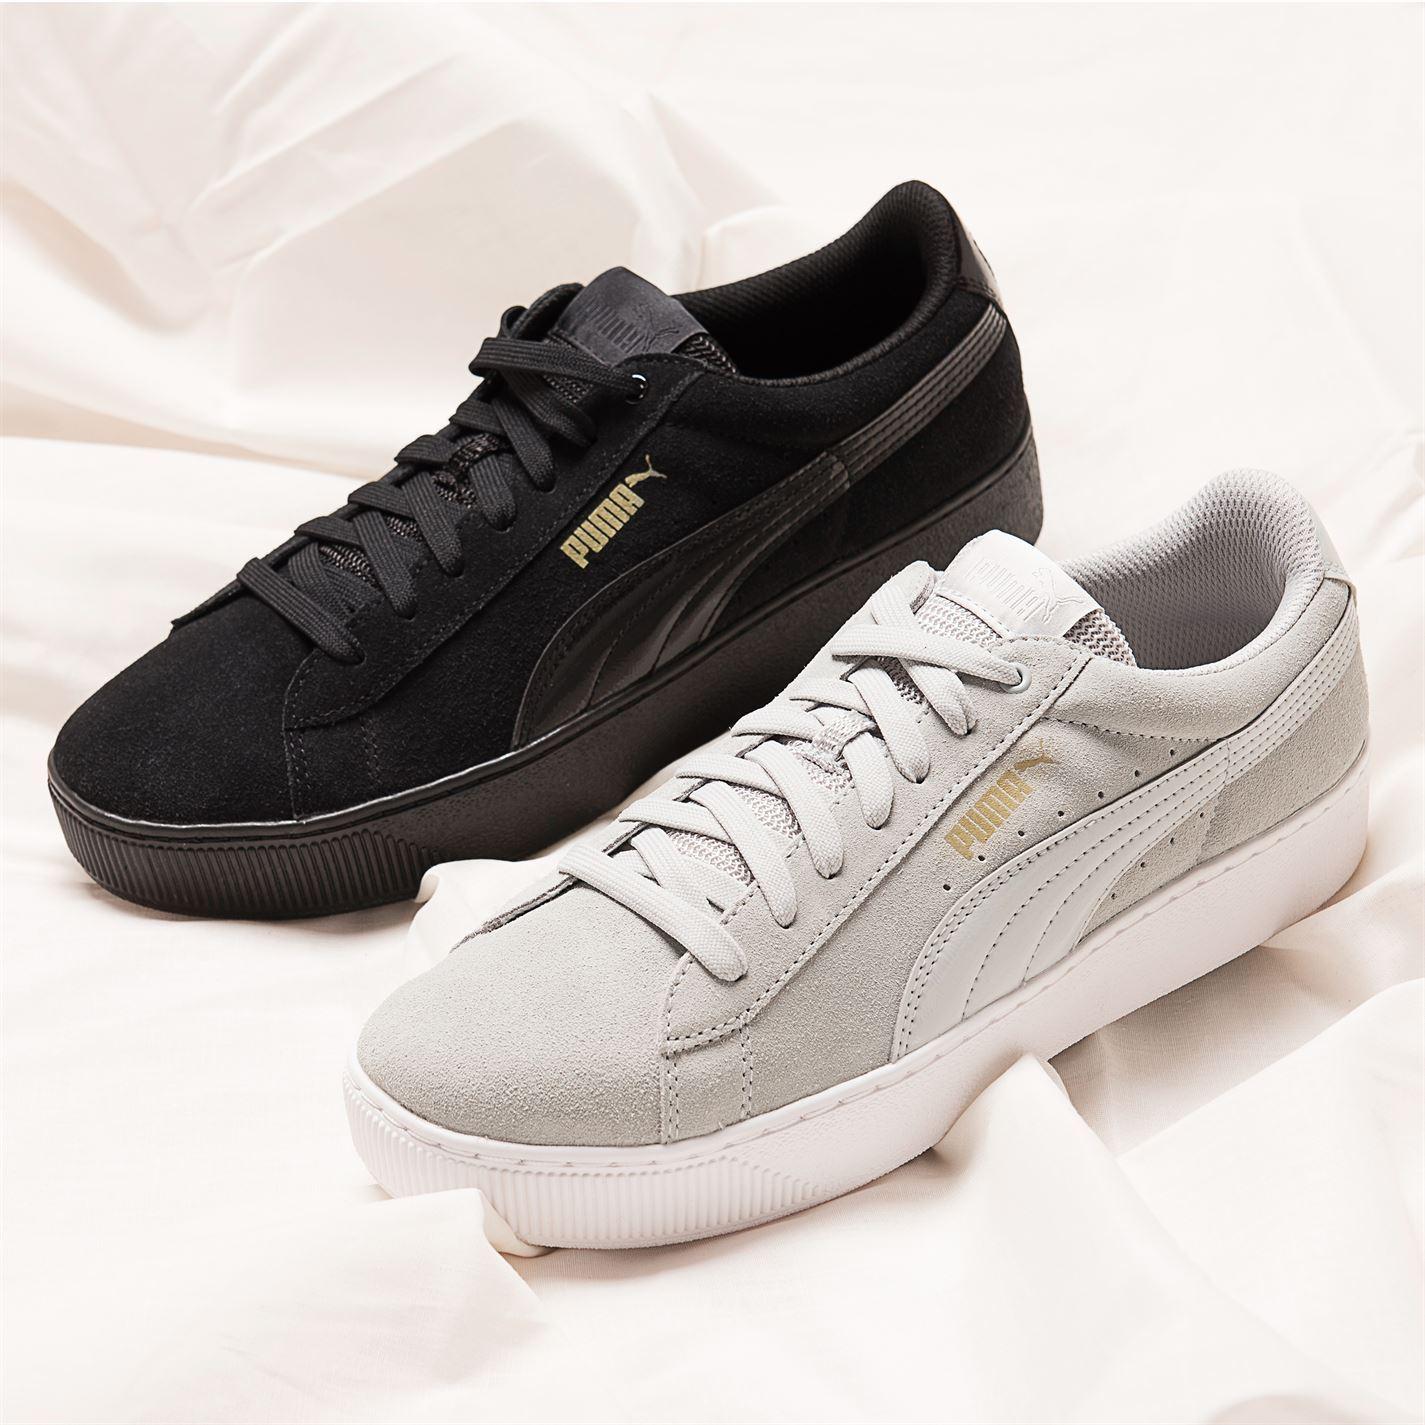 c1909905c140ce ... Puma Vikky Platform Trainers Womens Grey Violet Casual Sneakers Shoes  Footwear